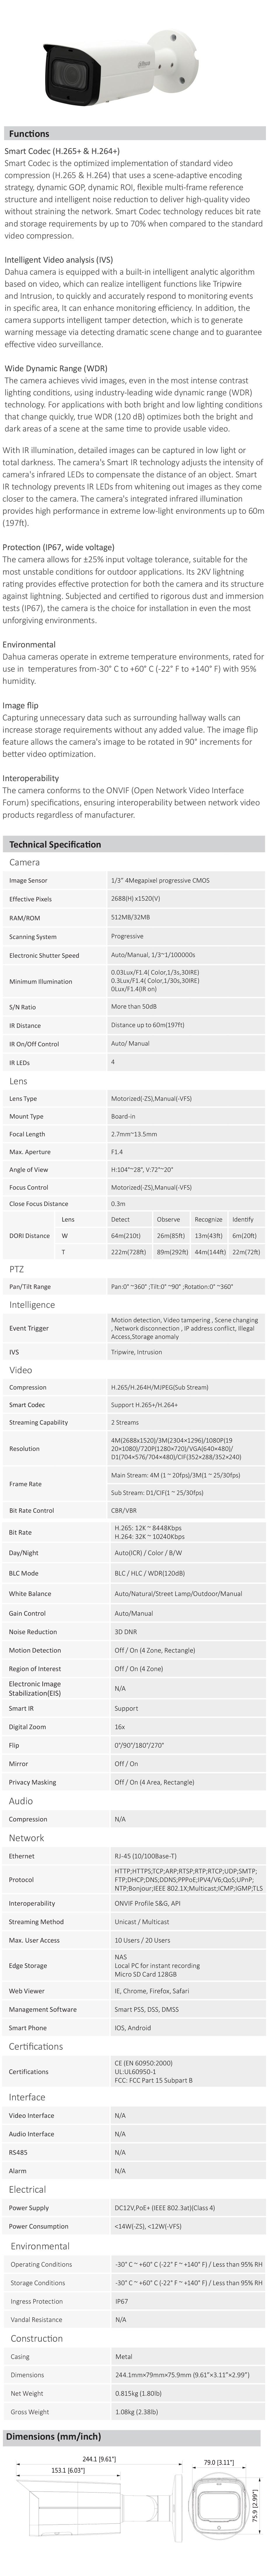 Dahua DH-IPC-HFW2431T-ZS 4MP WDR IR Bullet Camera - Overview 1